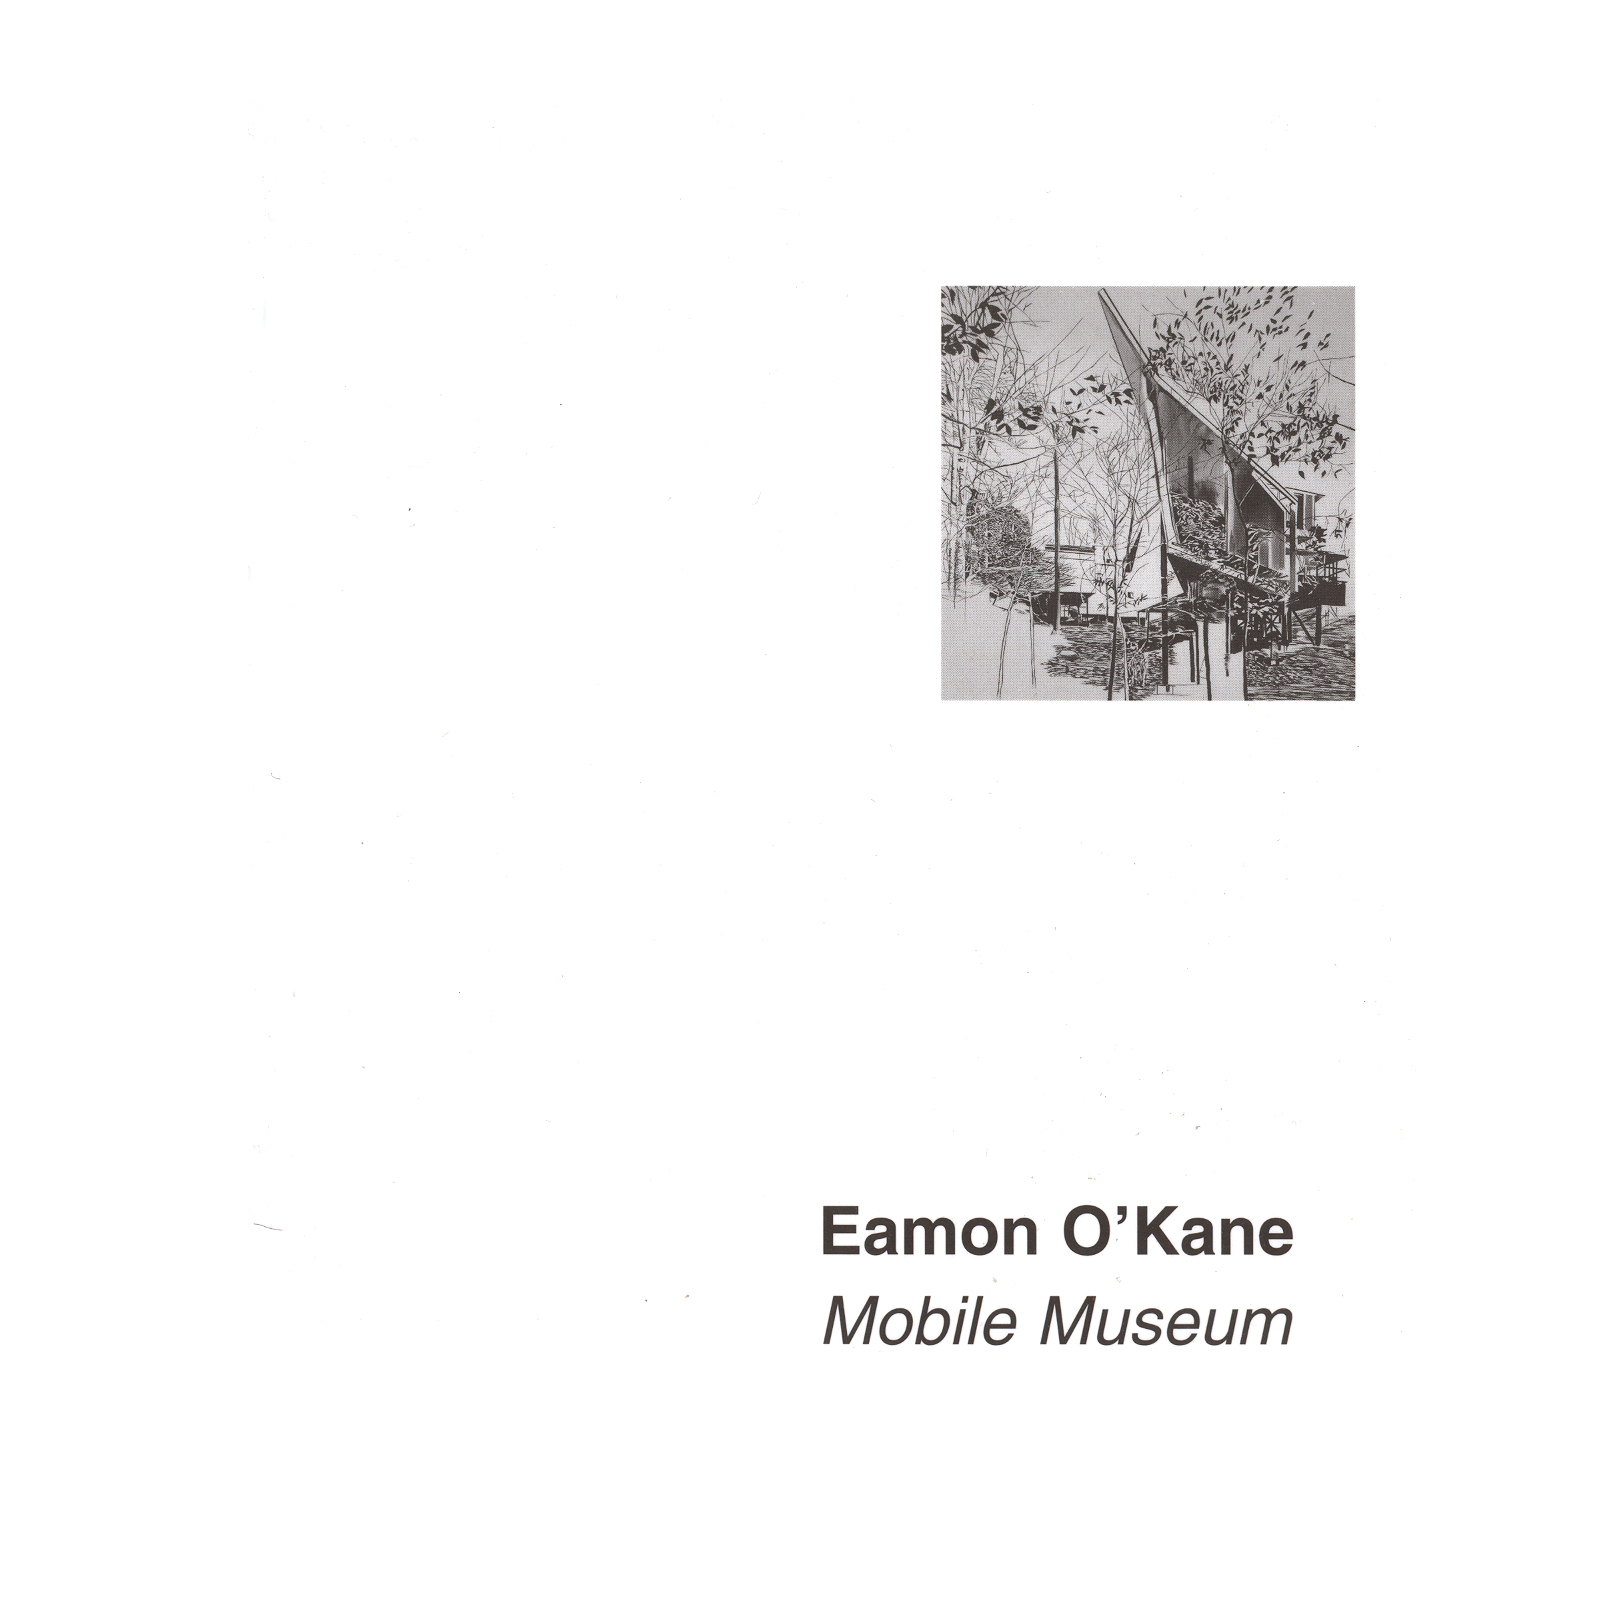 3.Eamon O'Kane.jpg